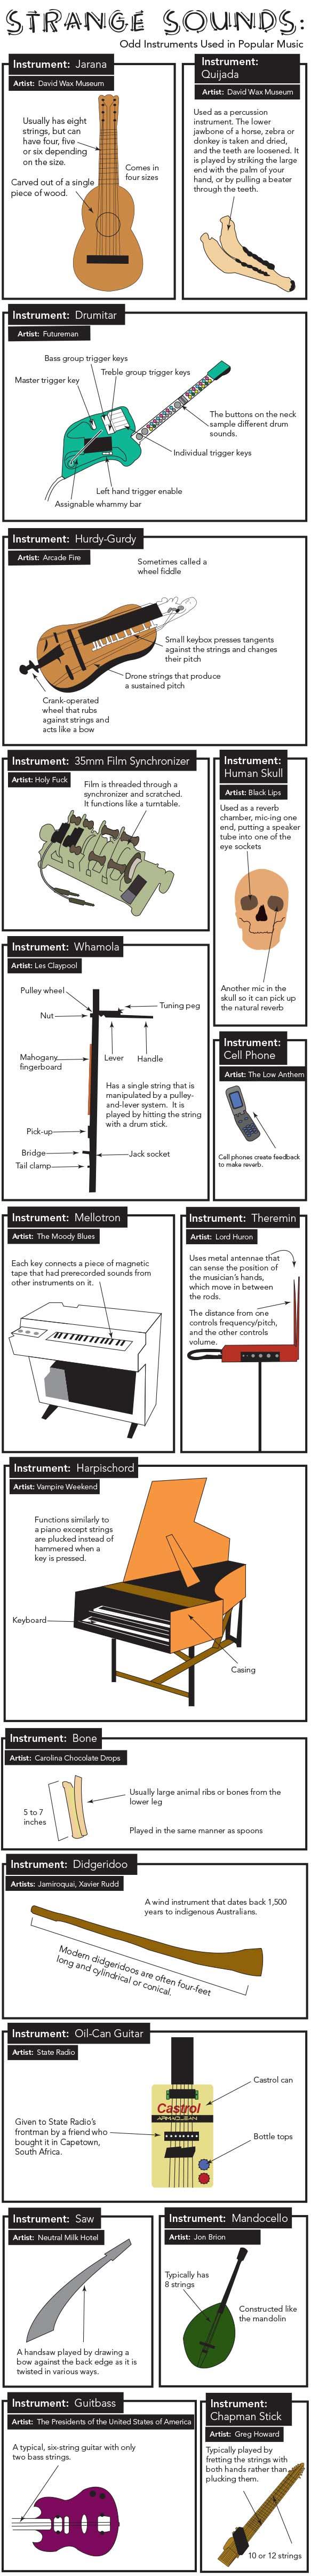 Strange Instruments Infographic